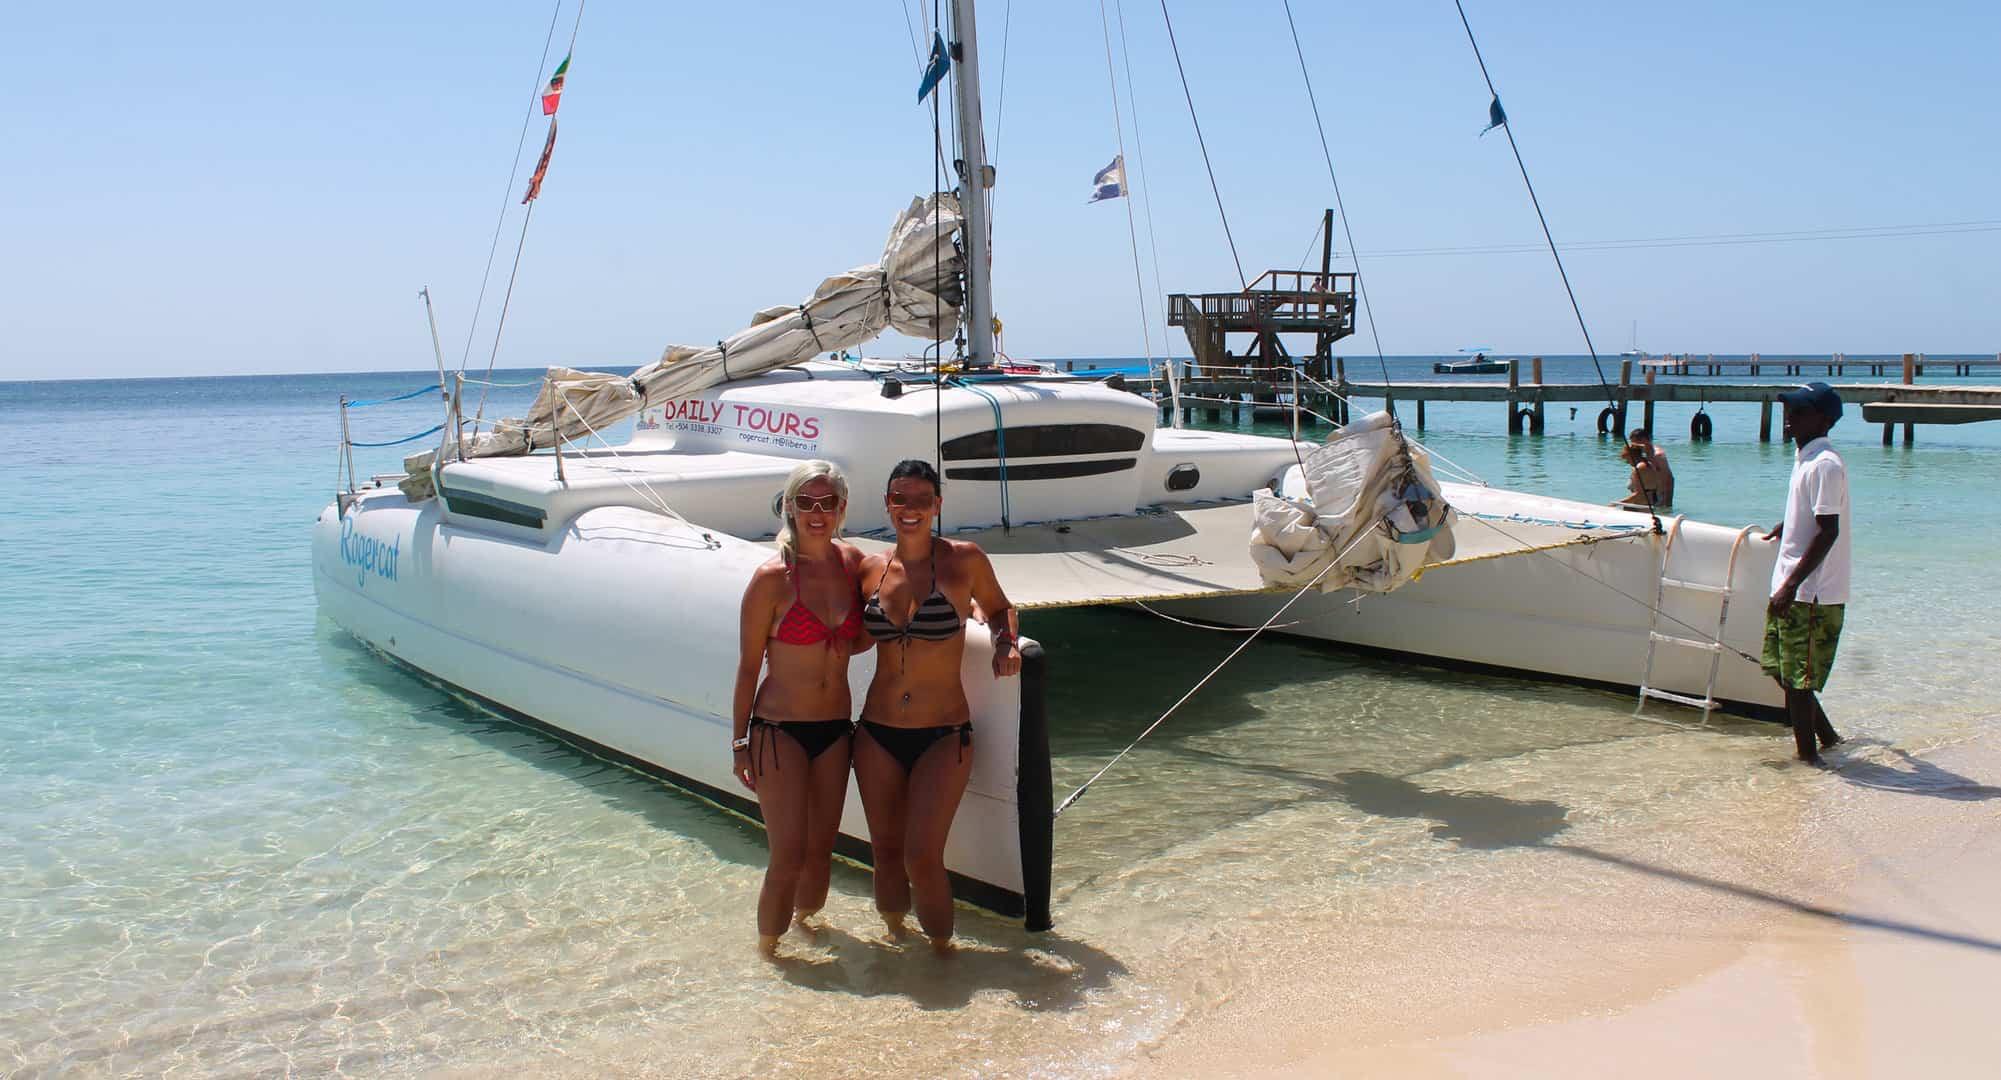 Roatan Cruise Excursions - Roatan Cruise Excursions